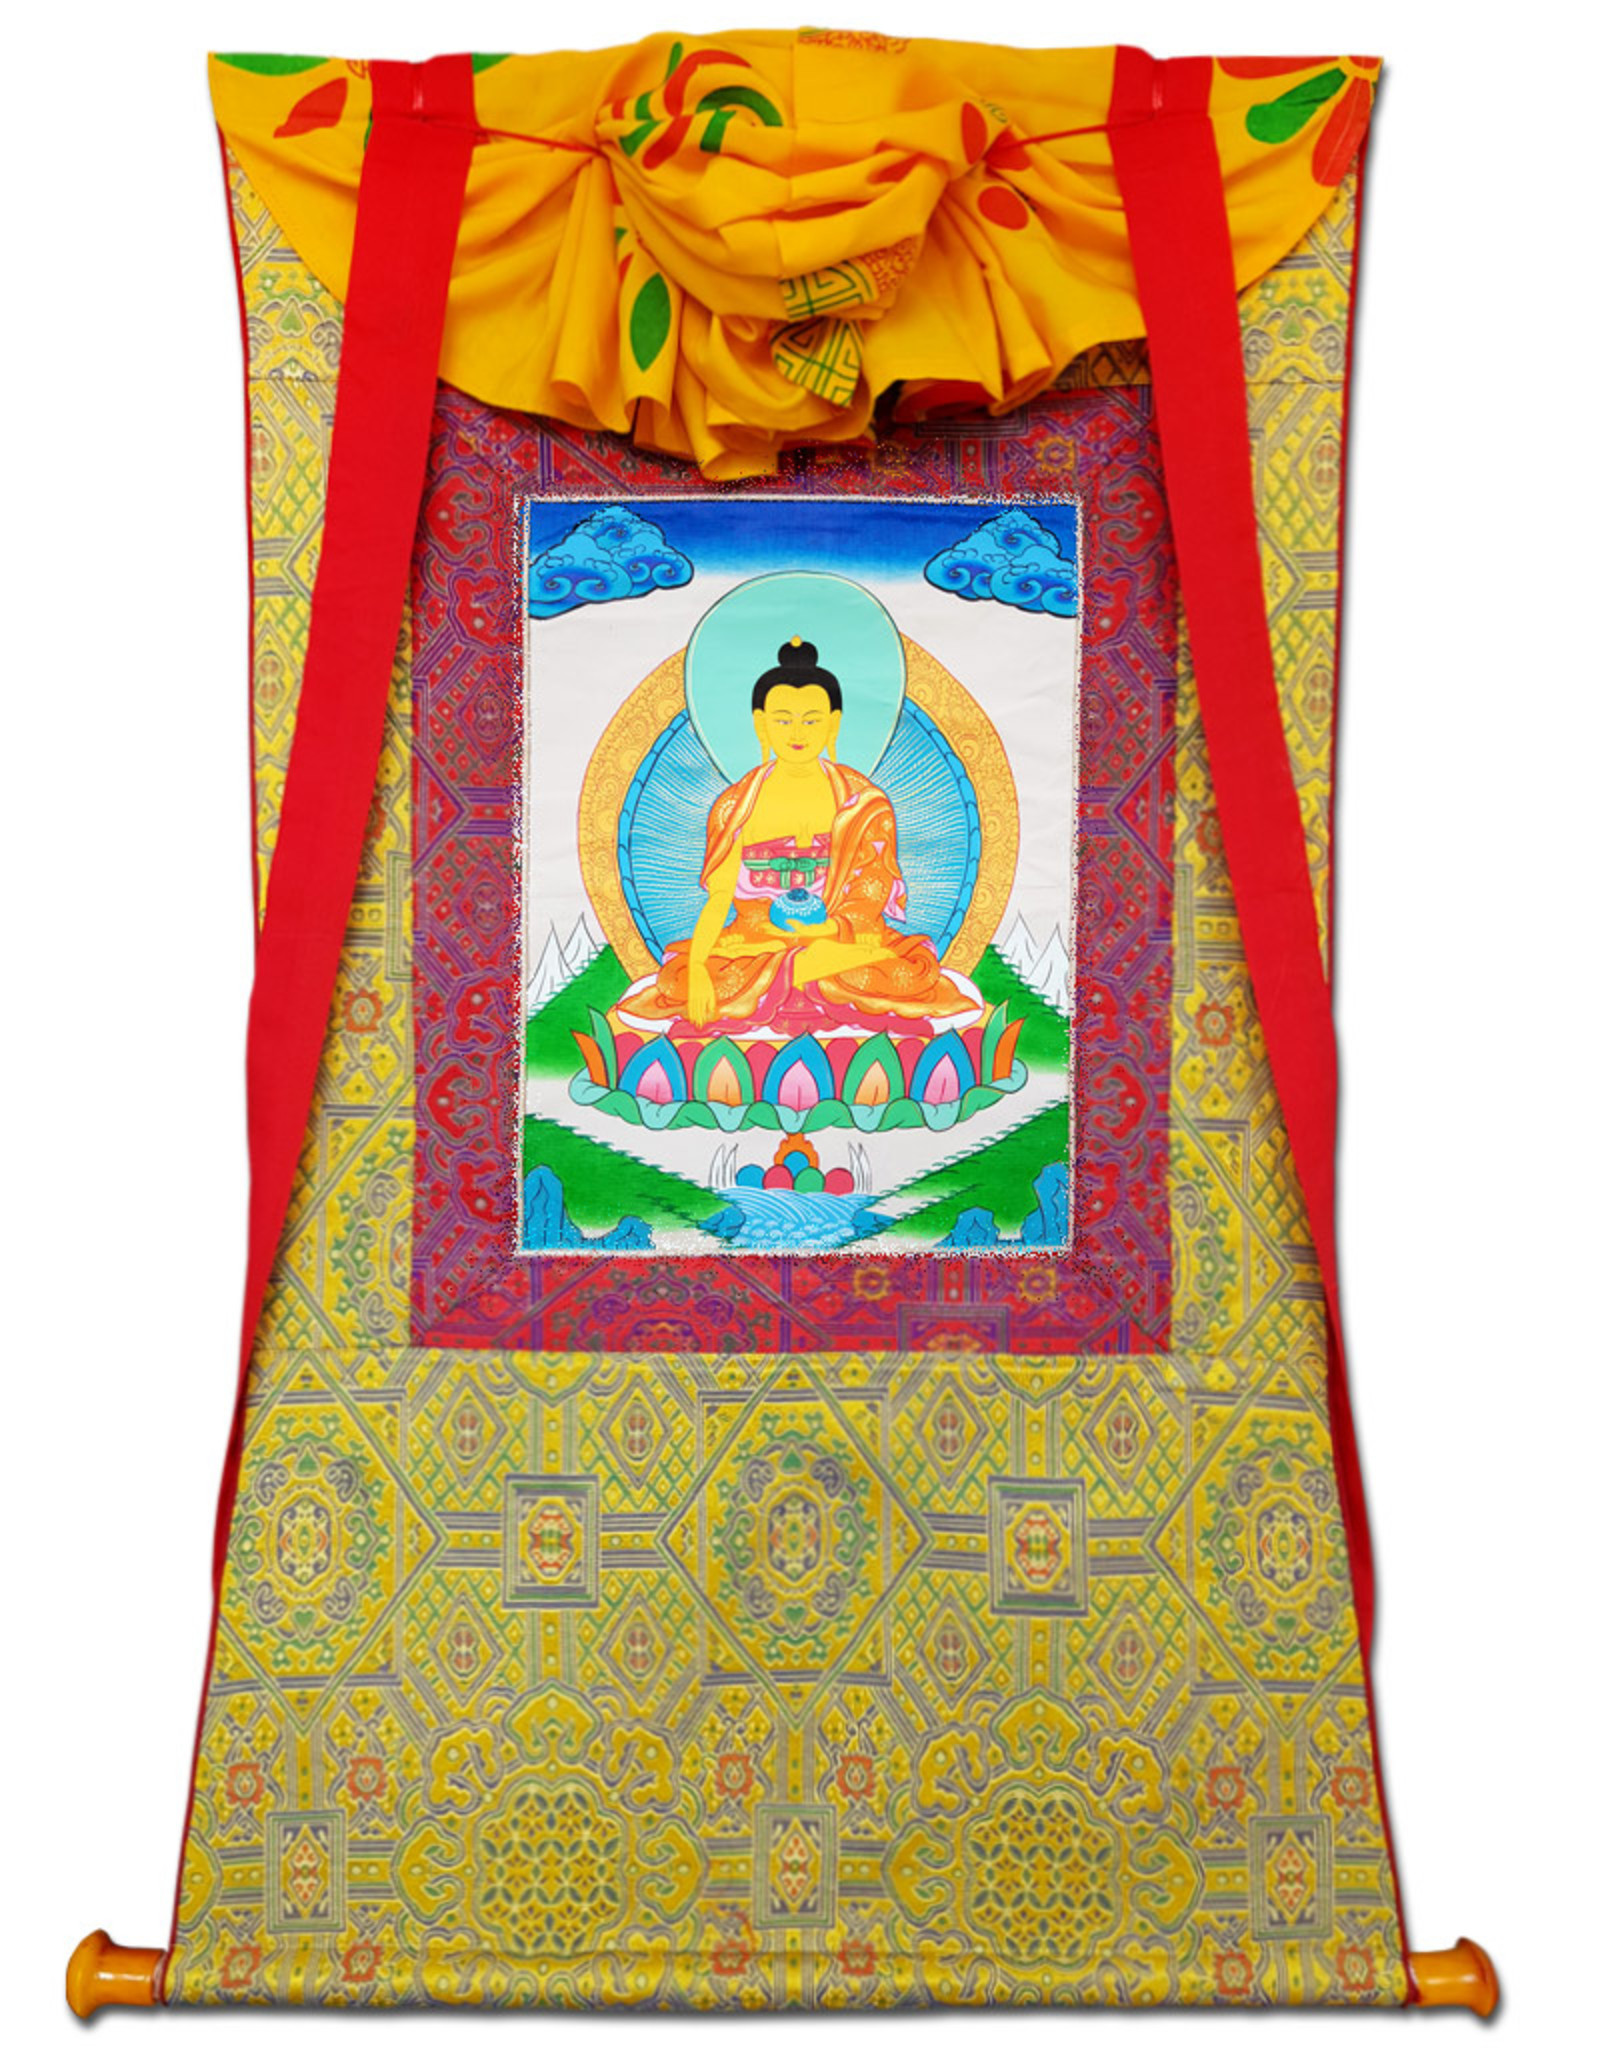 Tibetisches Thangka Buddha 95 x 53 cm